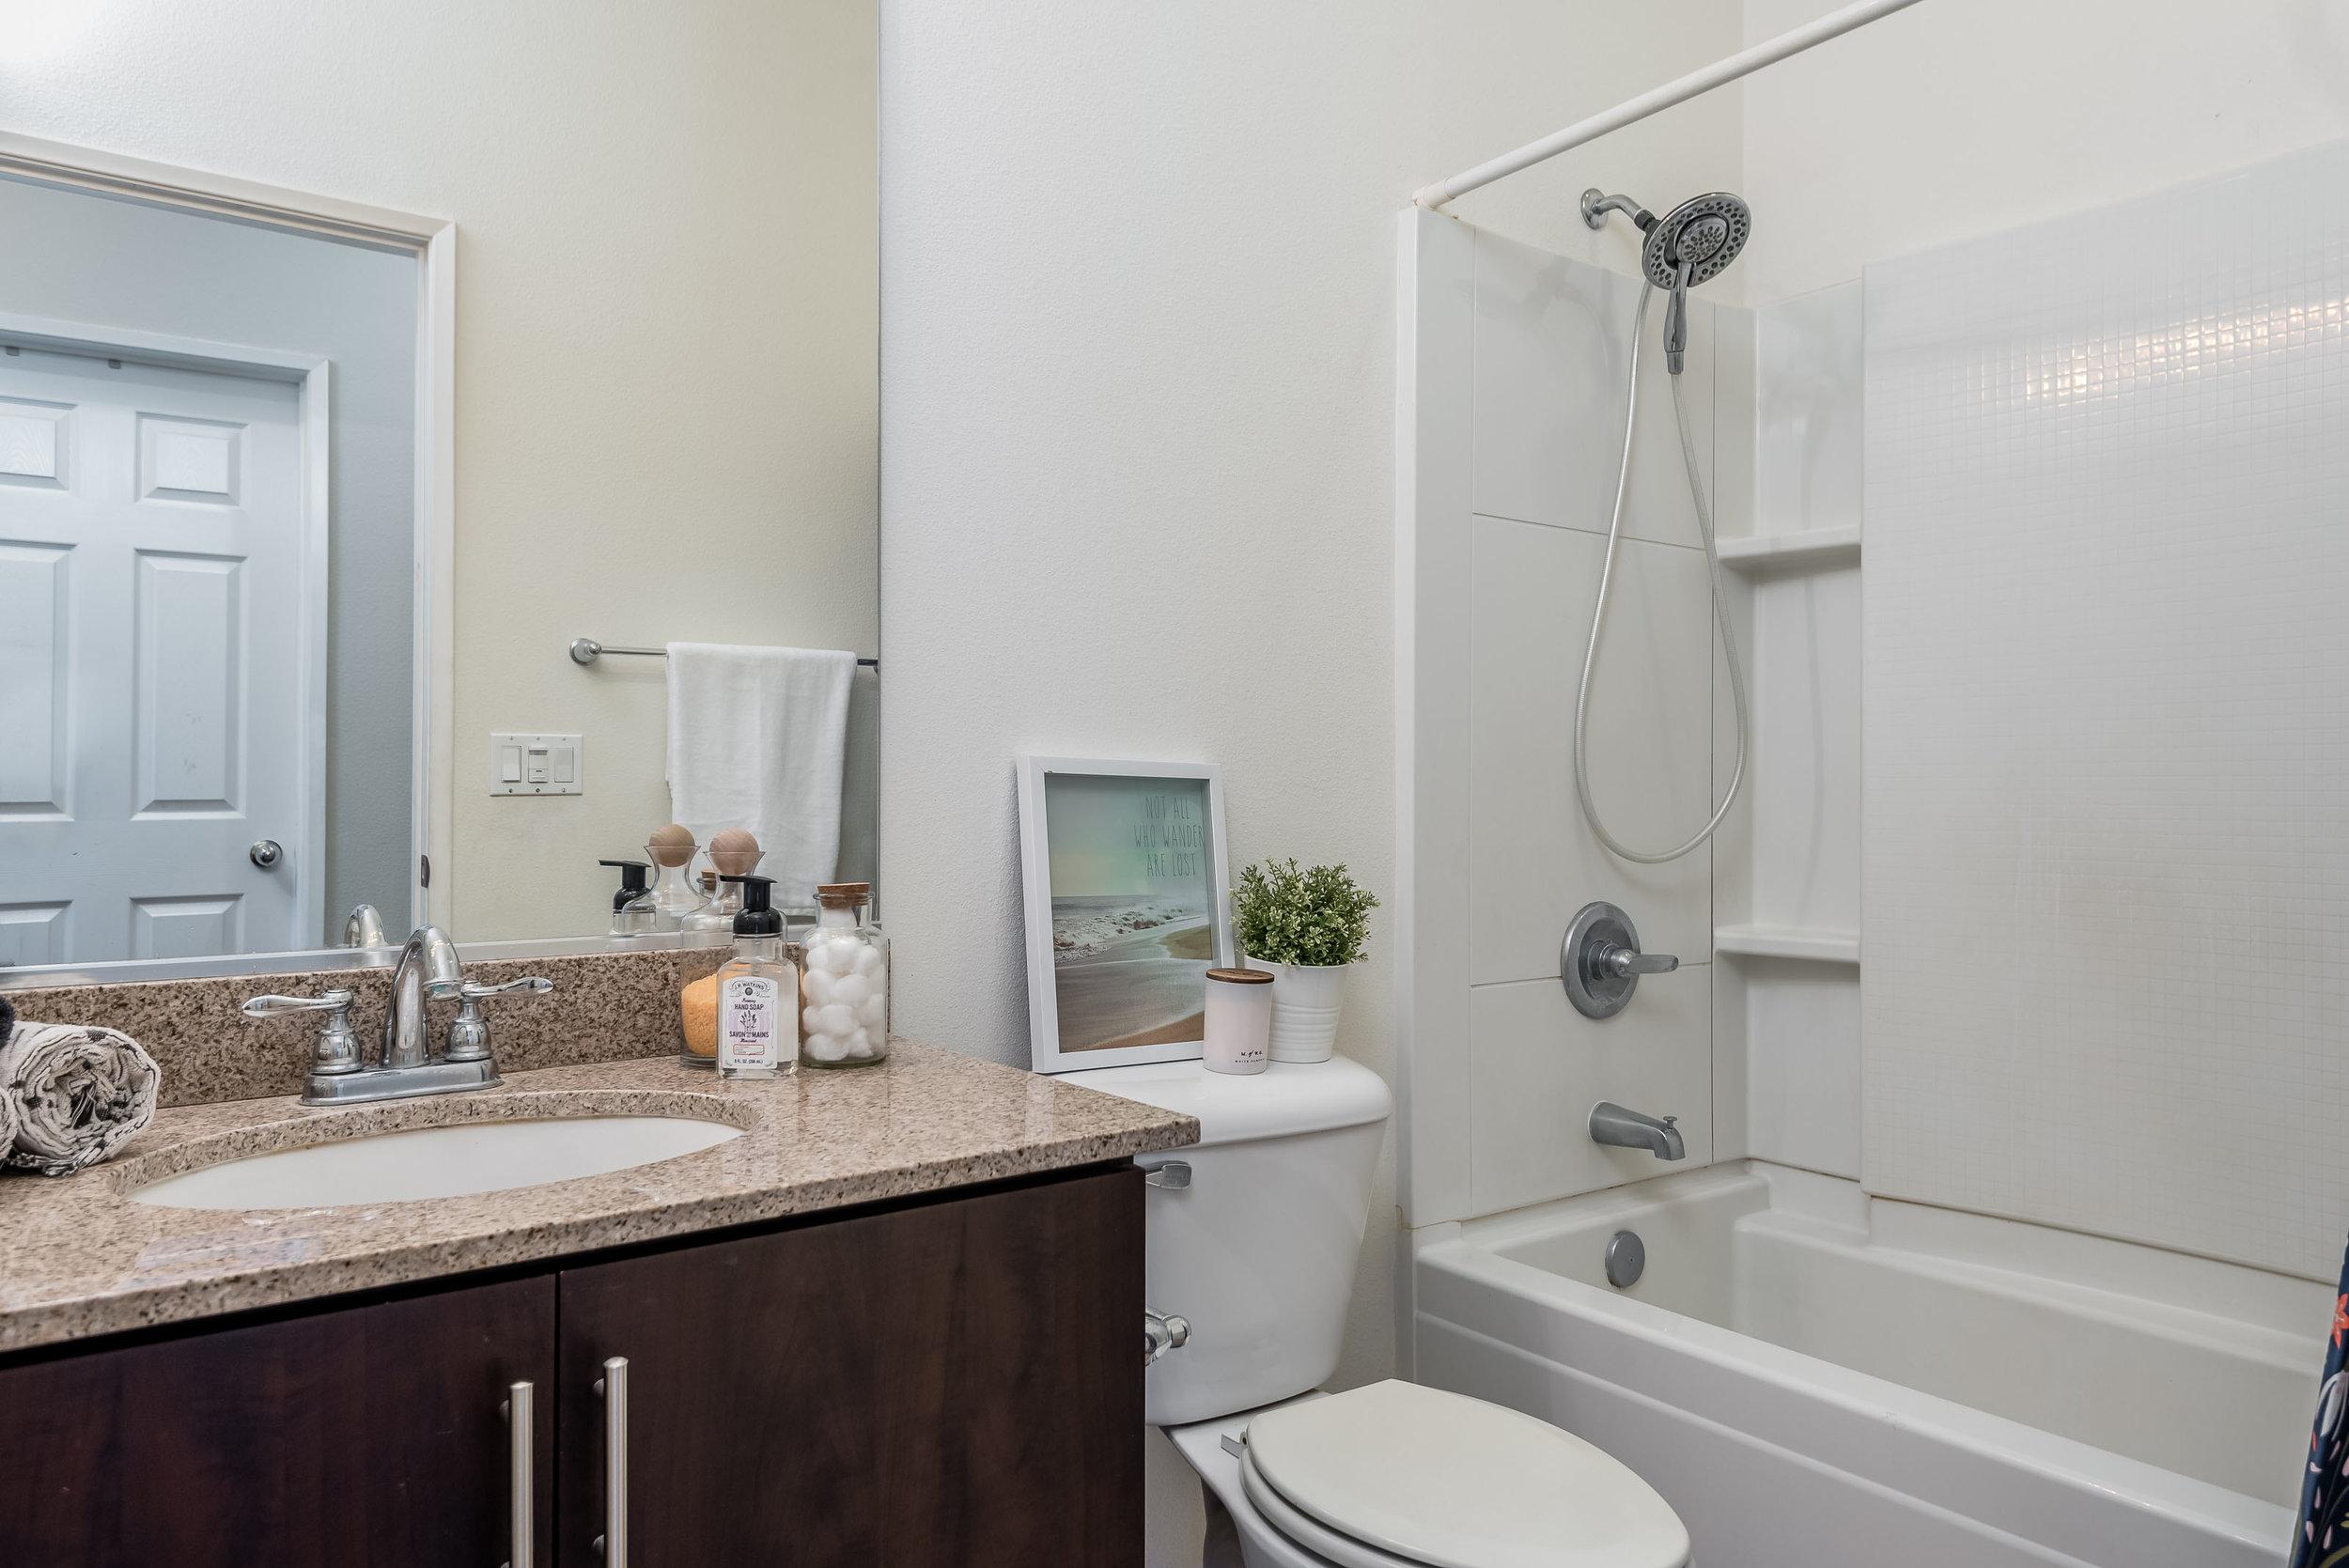 Copy of 014_14-Bathroom 2.jpg